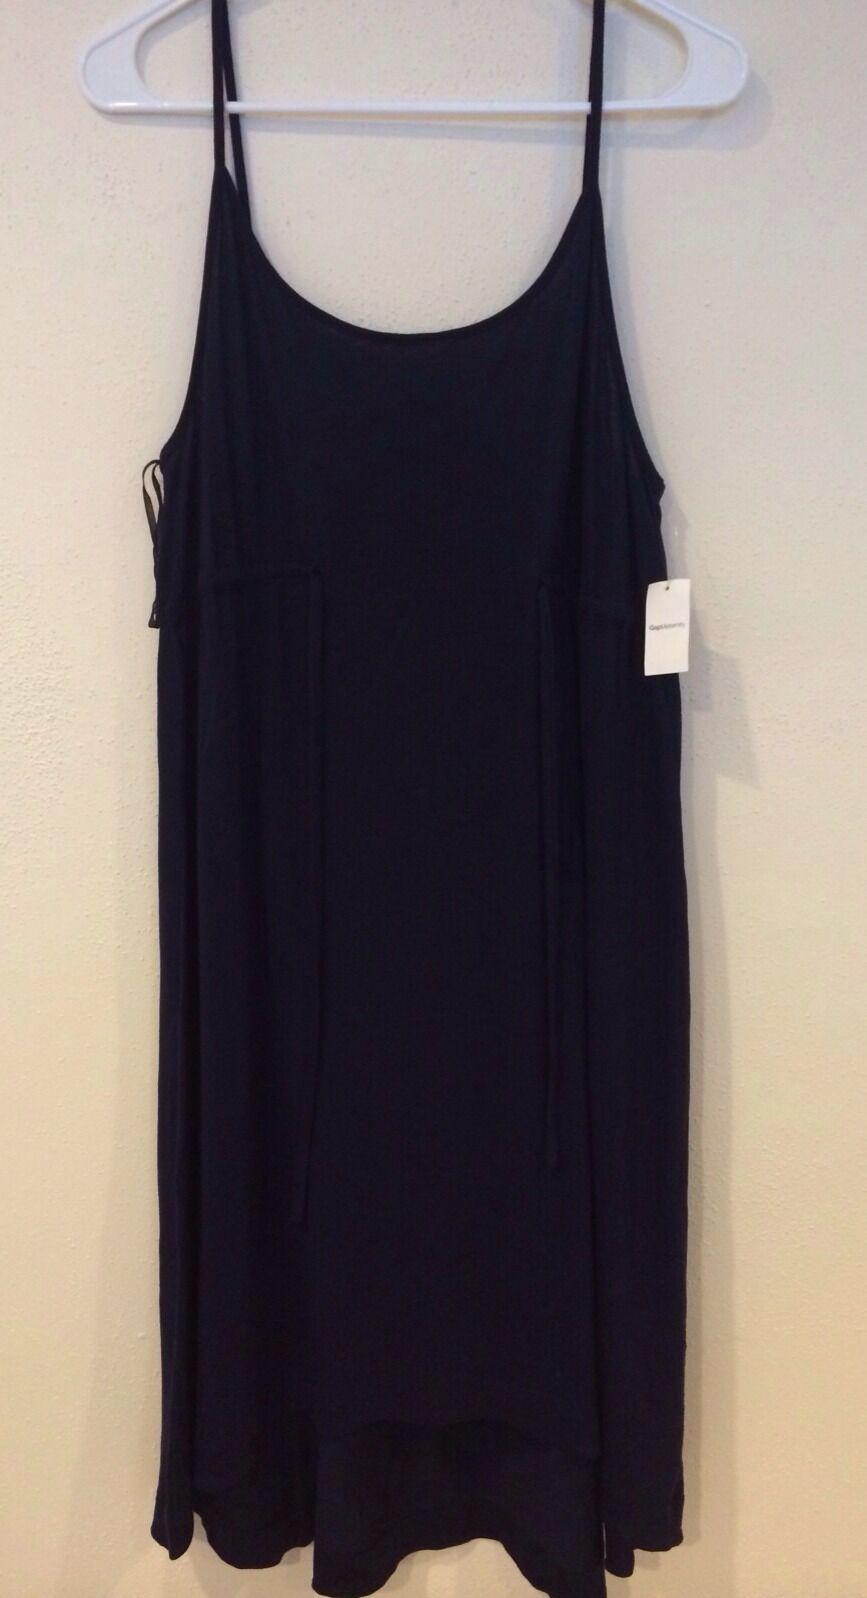 NWT Gap maternity navy spaghetti strap dress  size L